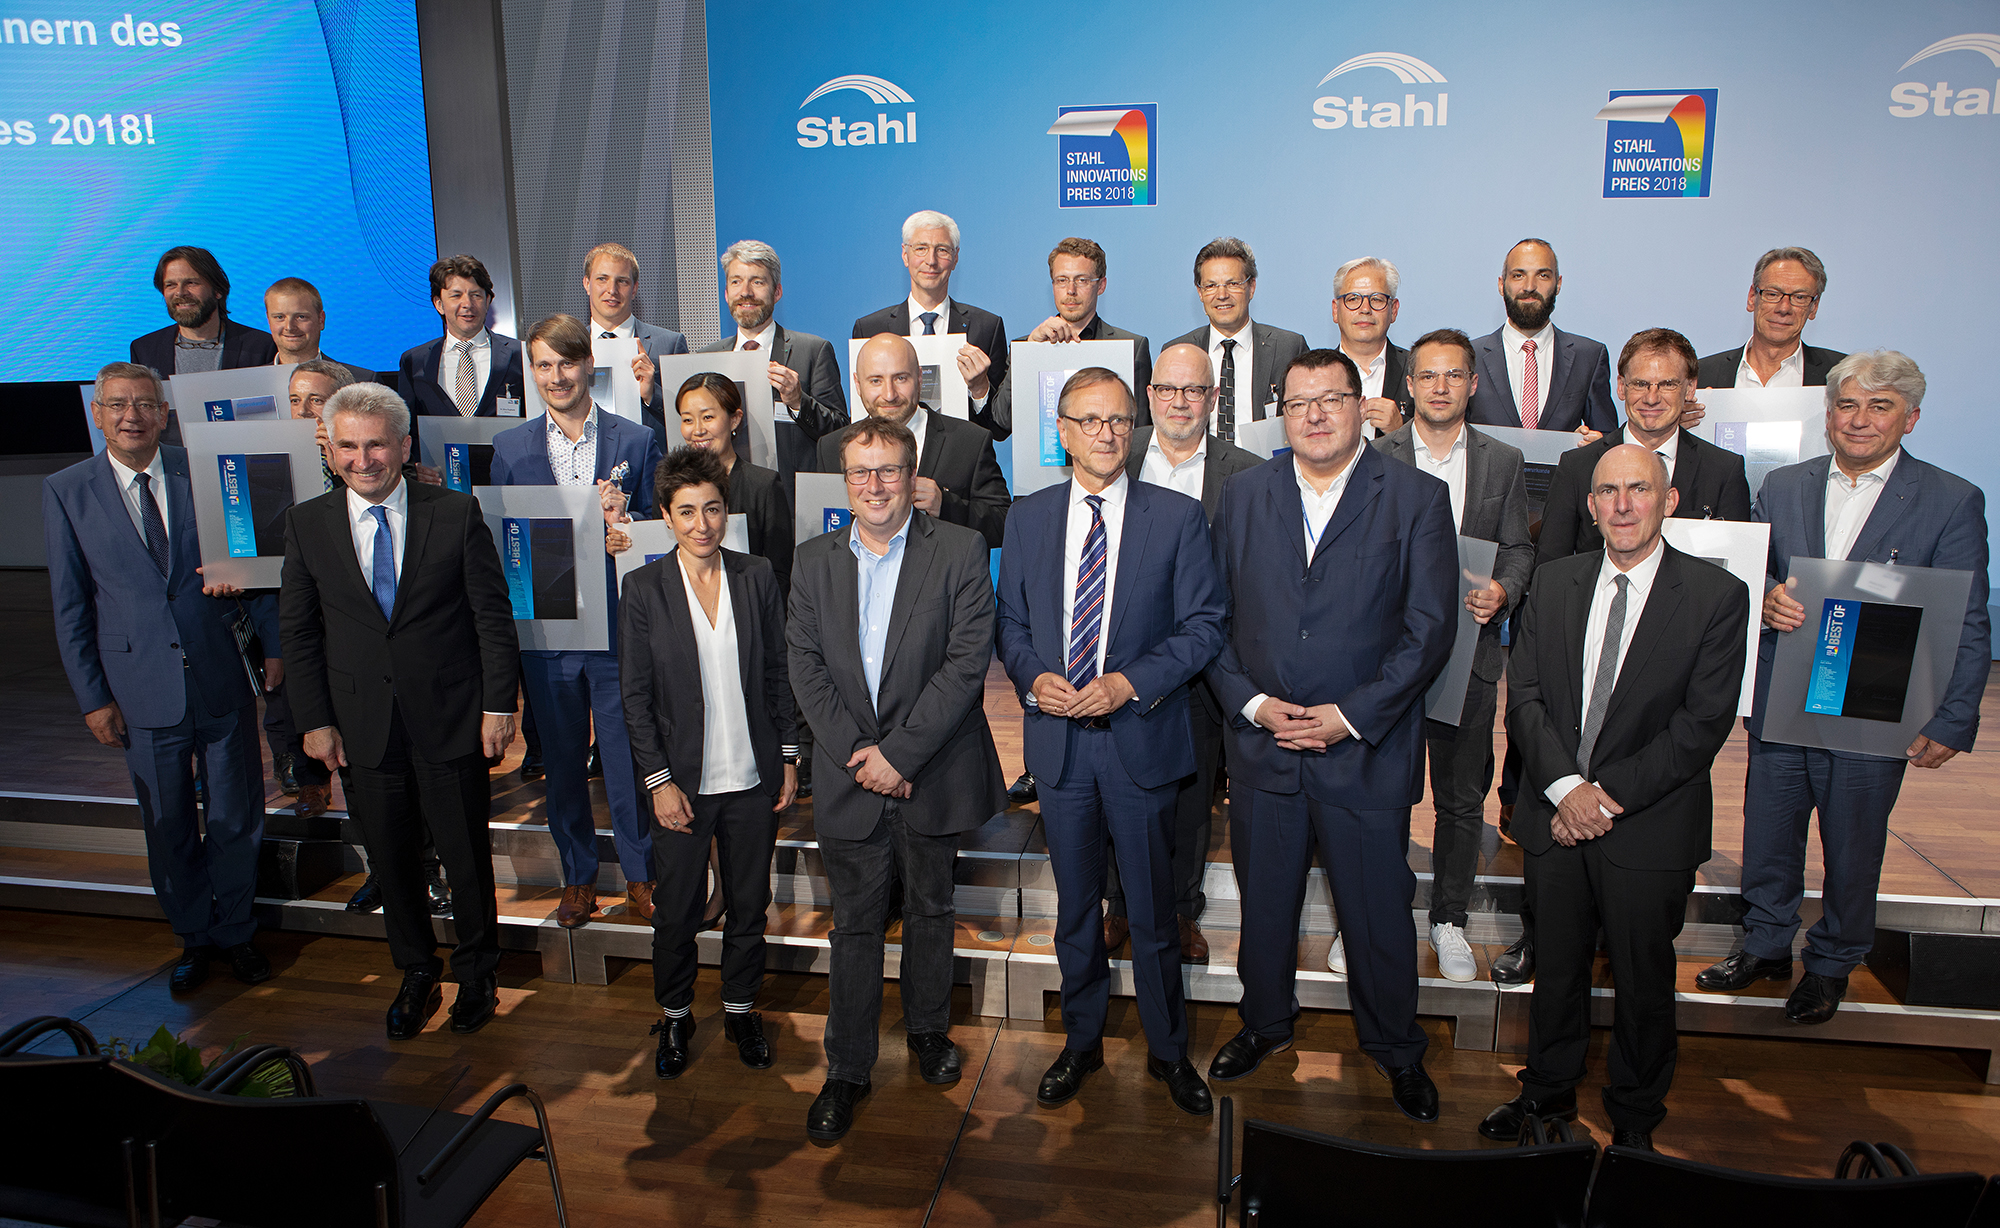 Berliner Stahldialog 2018